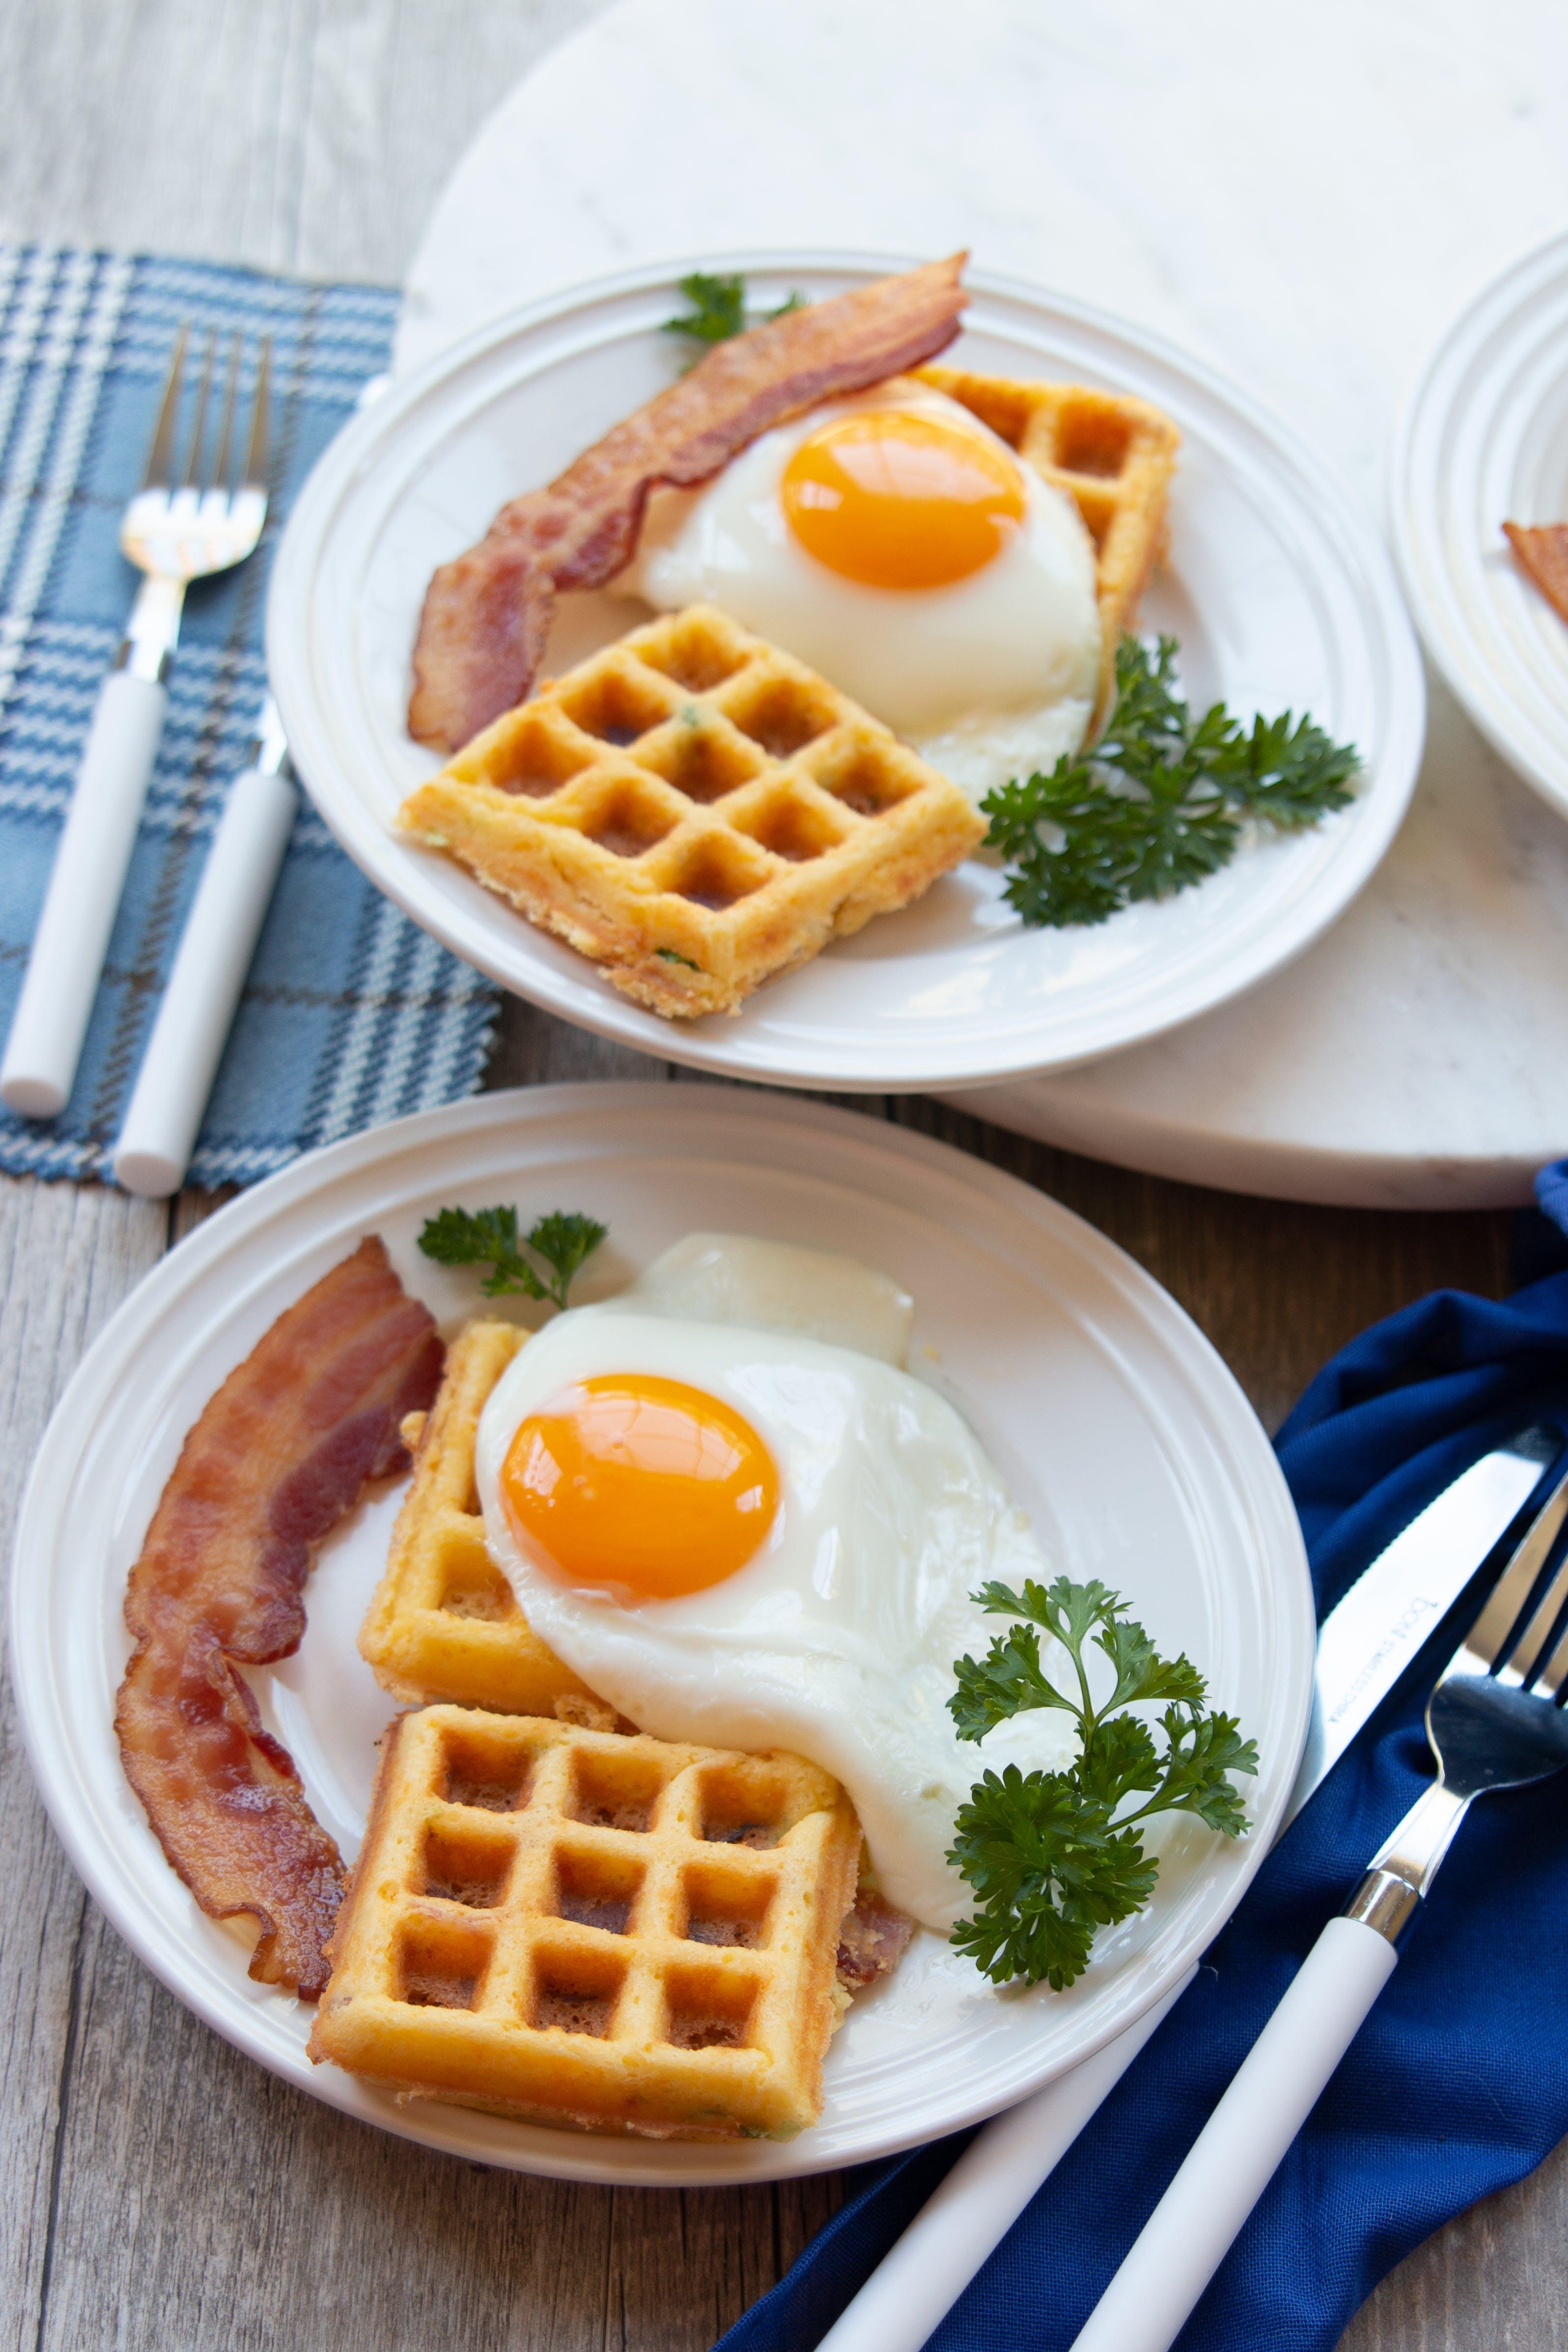 Keto bacon cheddar cornbread waffles with egg and bacon